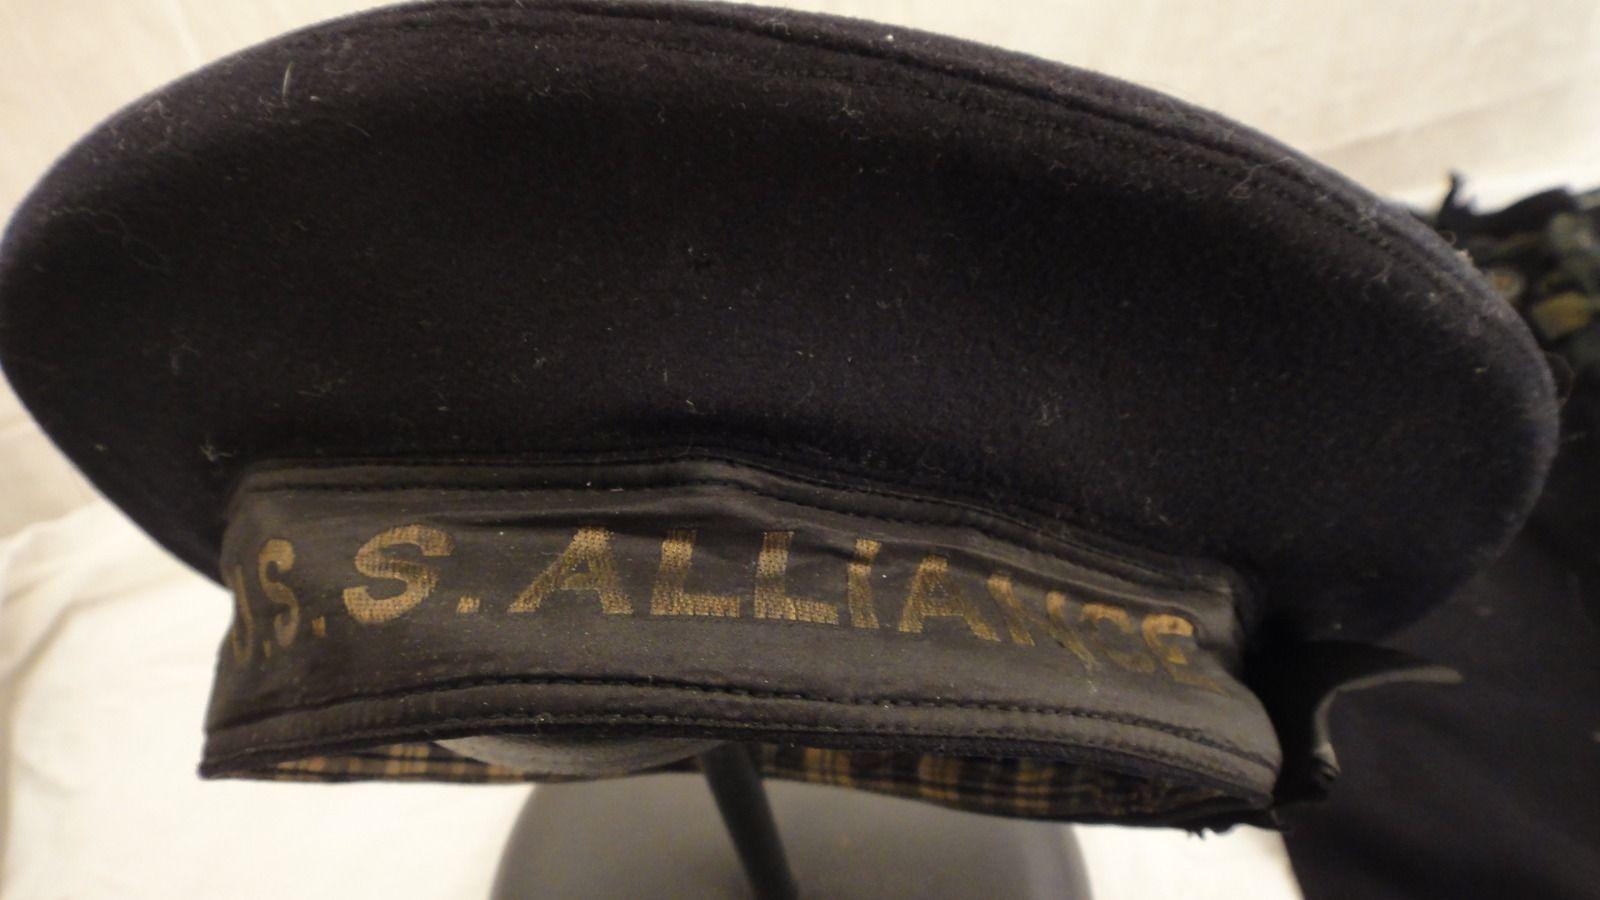 6bcc53a24e0 U.s. Navy flat hats pre ww2 - Page 7